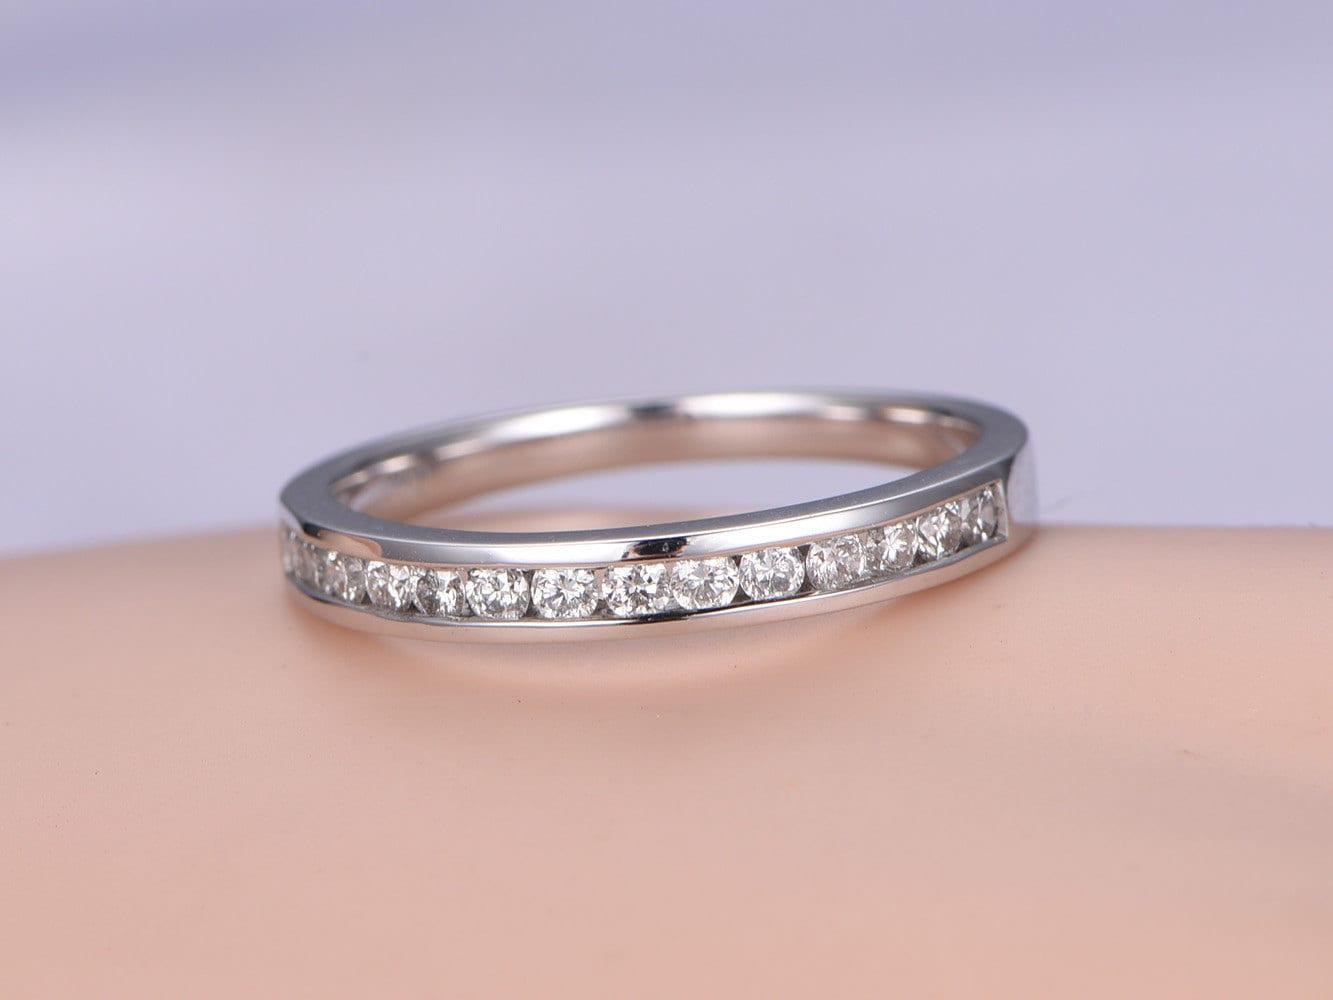 SI-H natural Diamond wedding band solid 14k white gold half